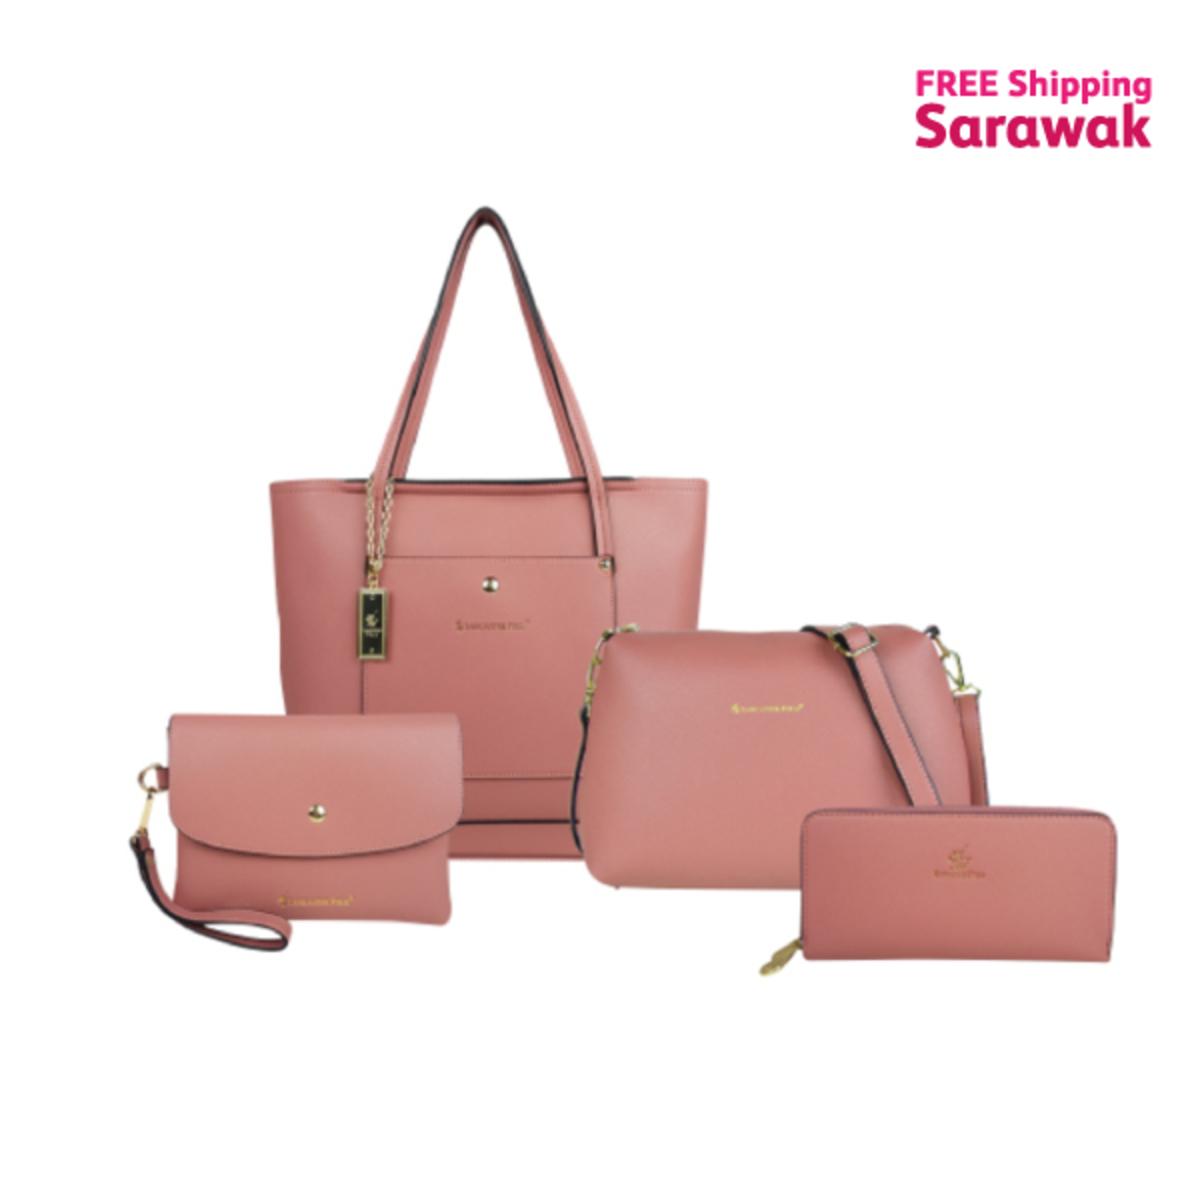 ca580a17aa0 [SW] Lancaster Polo Tuscany Handbags set | Go Shop